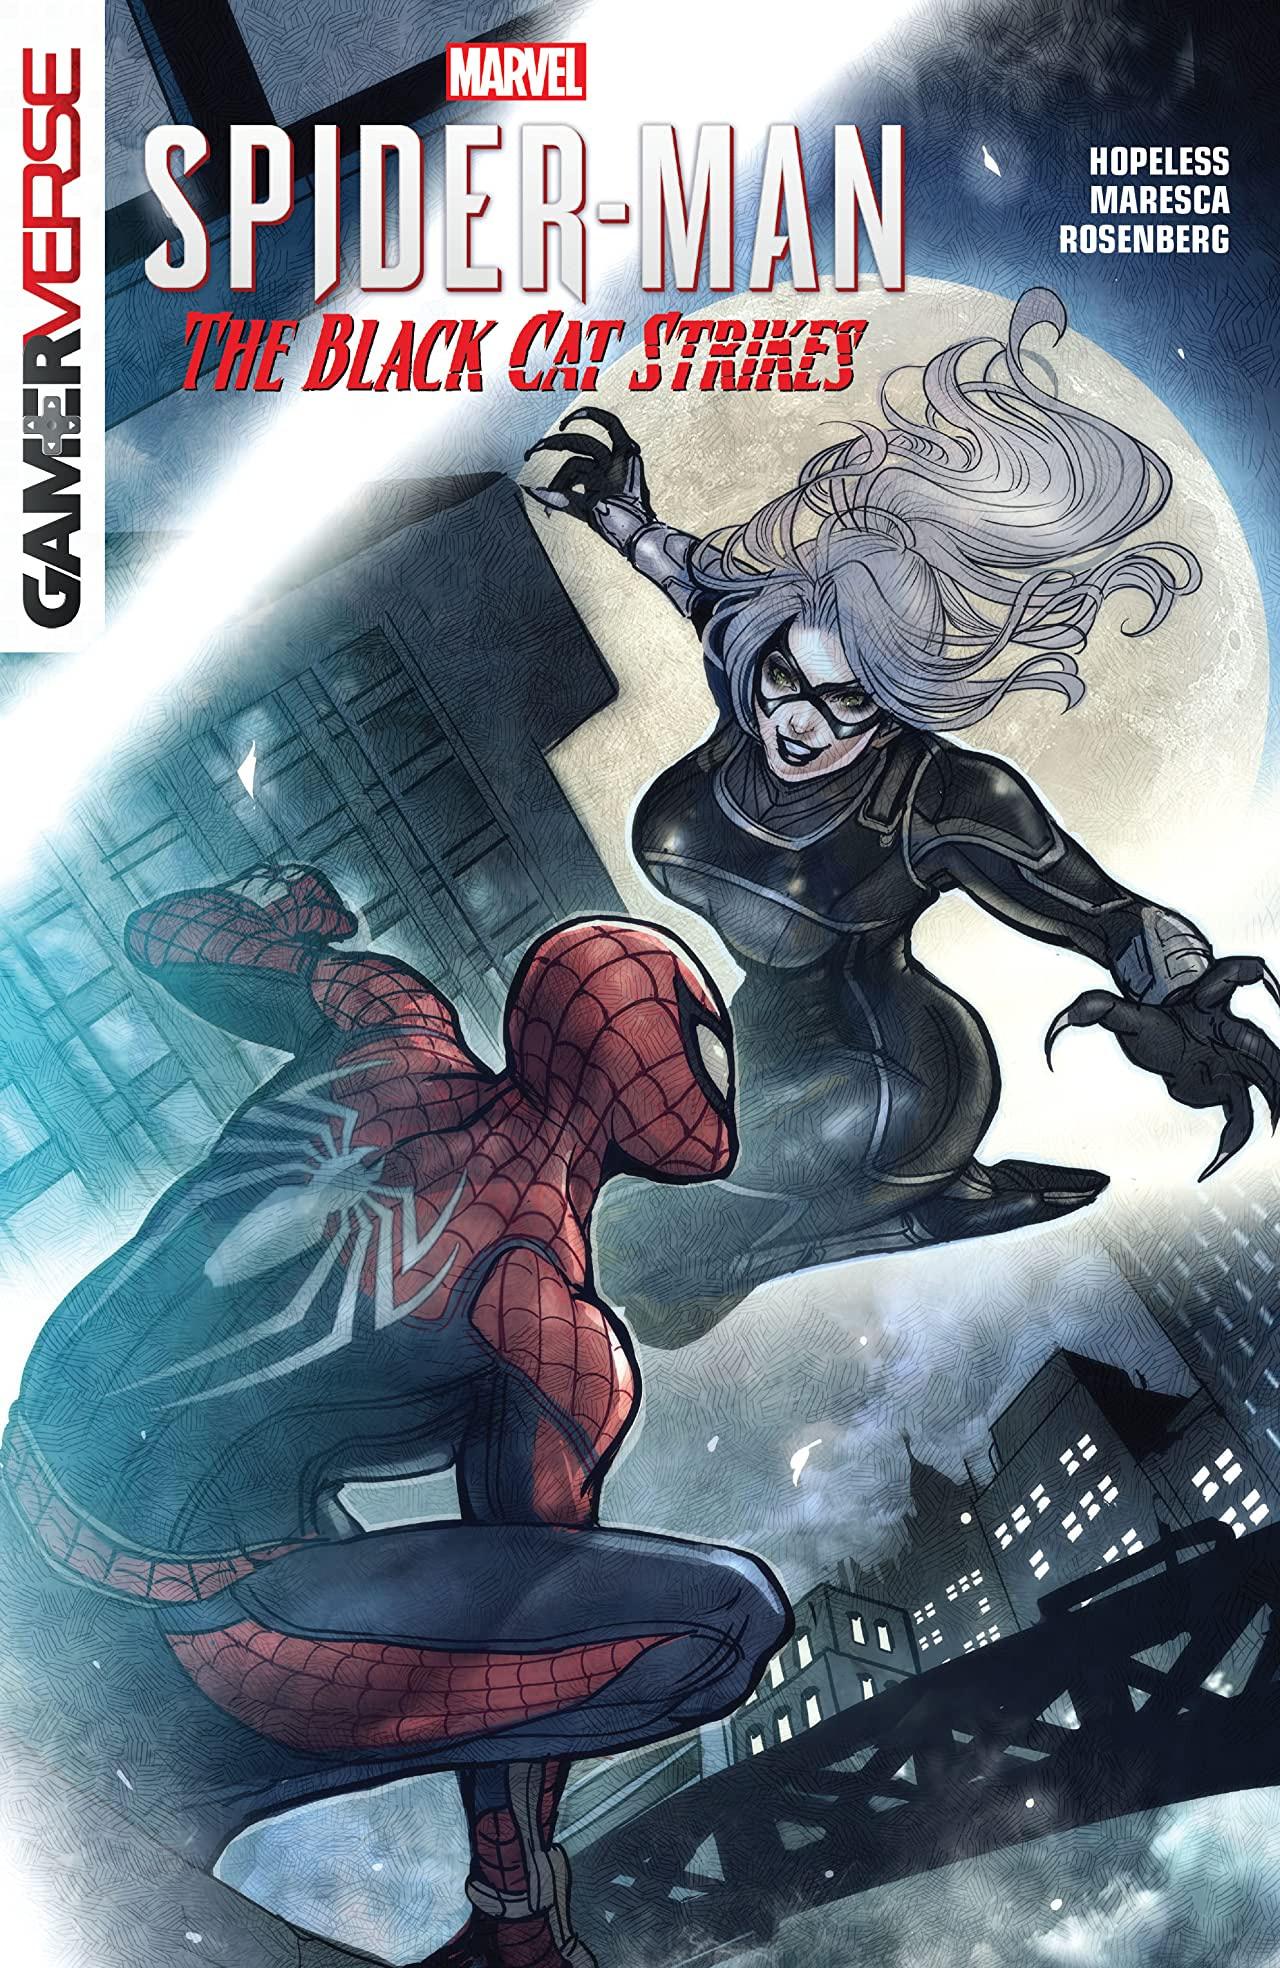 Marvel's Spider-Man: The Black Cat Strikes TPB Vol 1 1